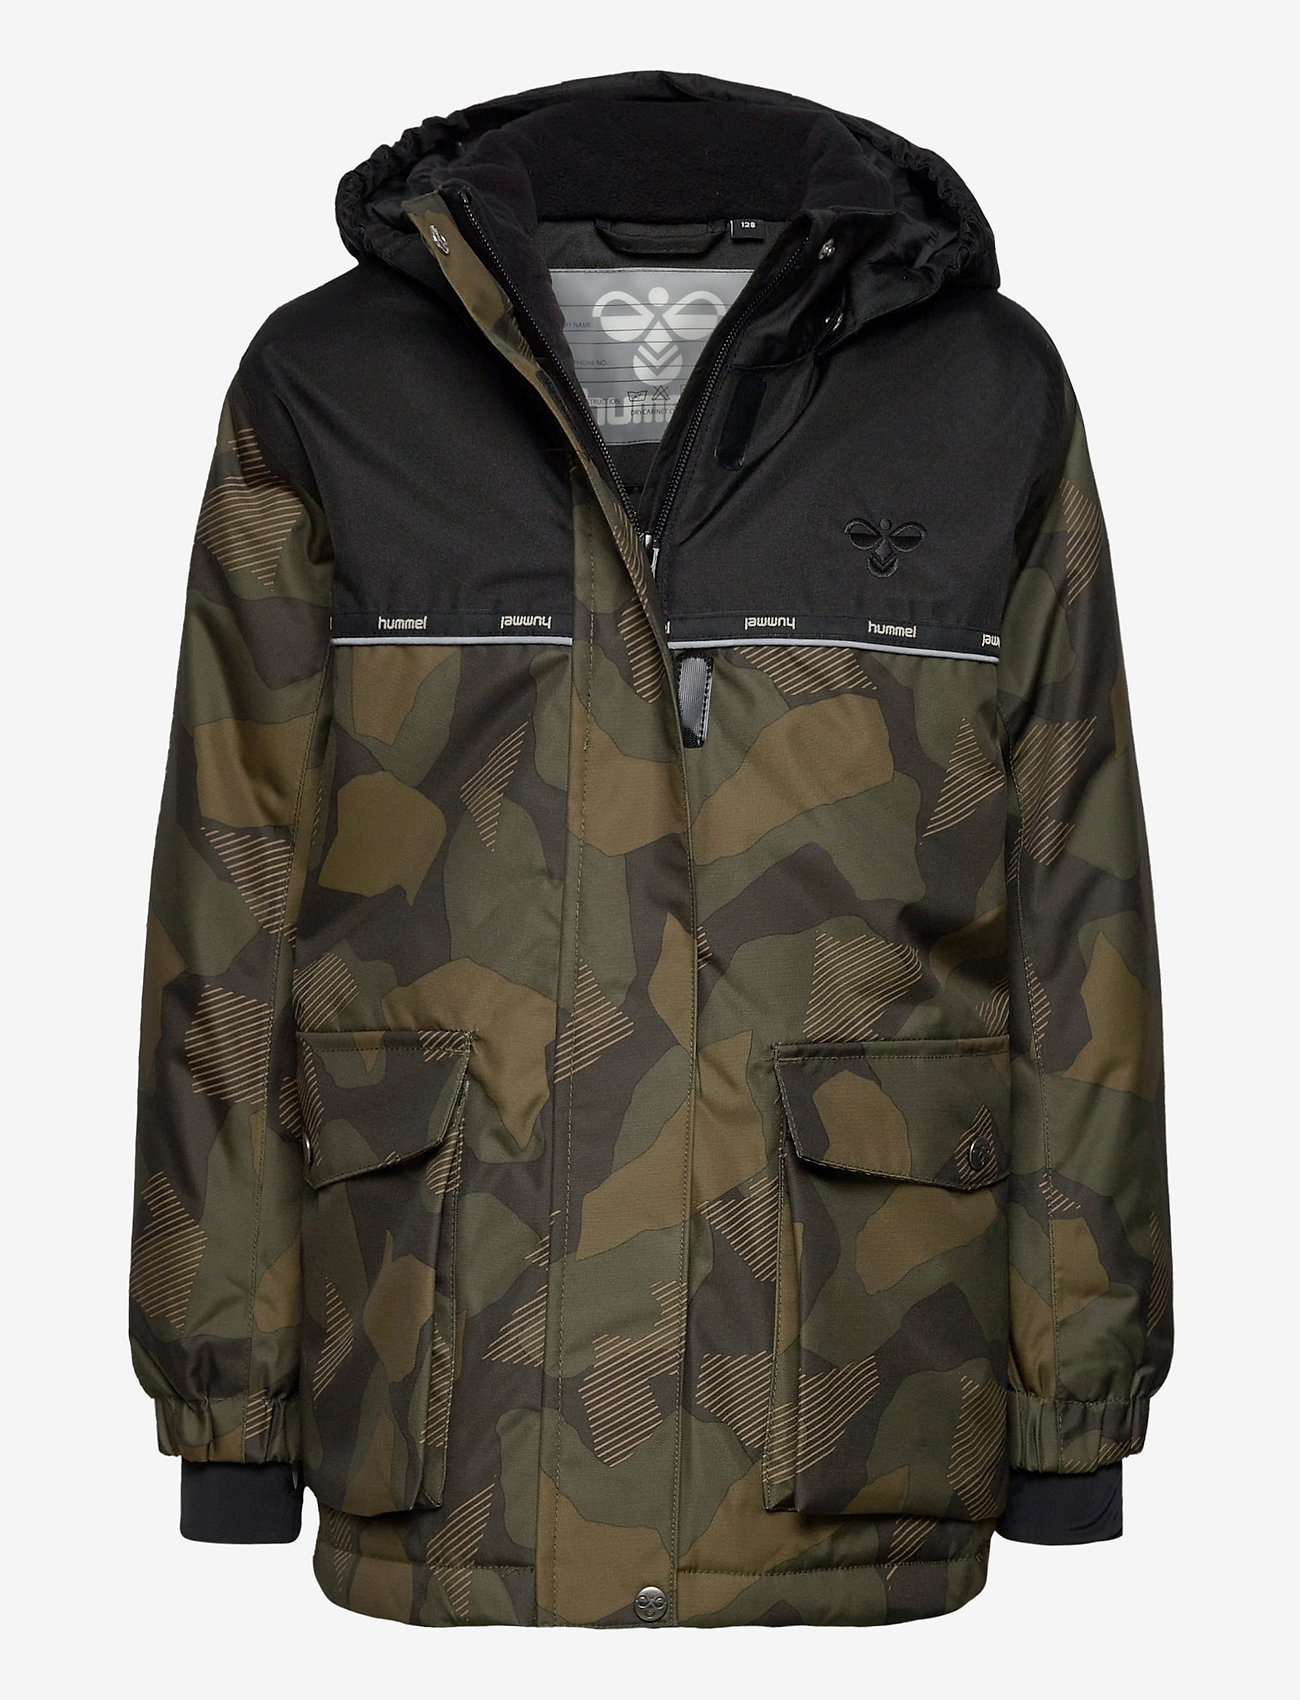 Hummel - hmlWEST JACKET - insulated jackets - olive night/ ecru olive - 0